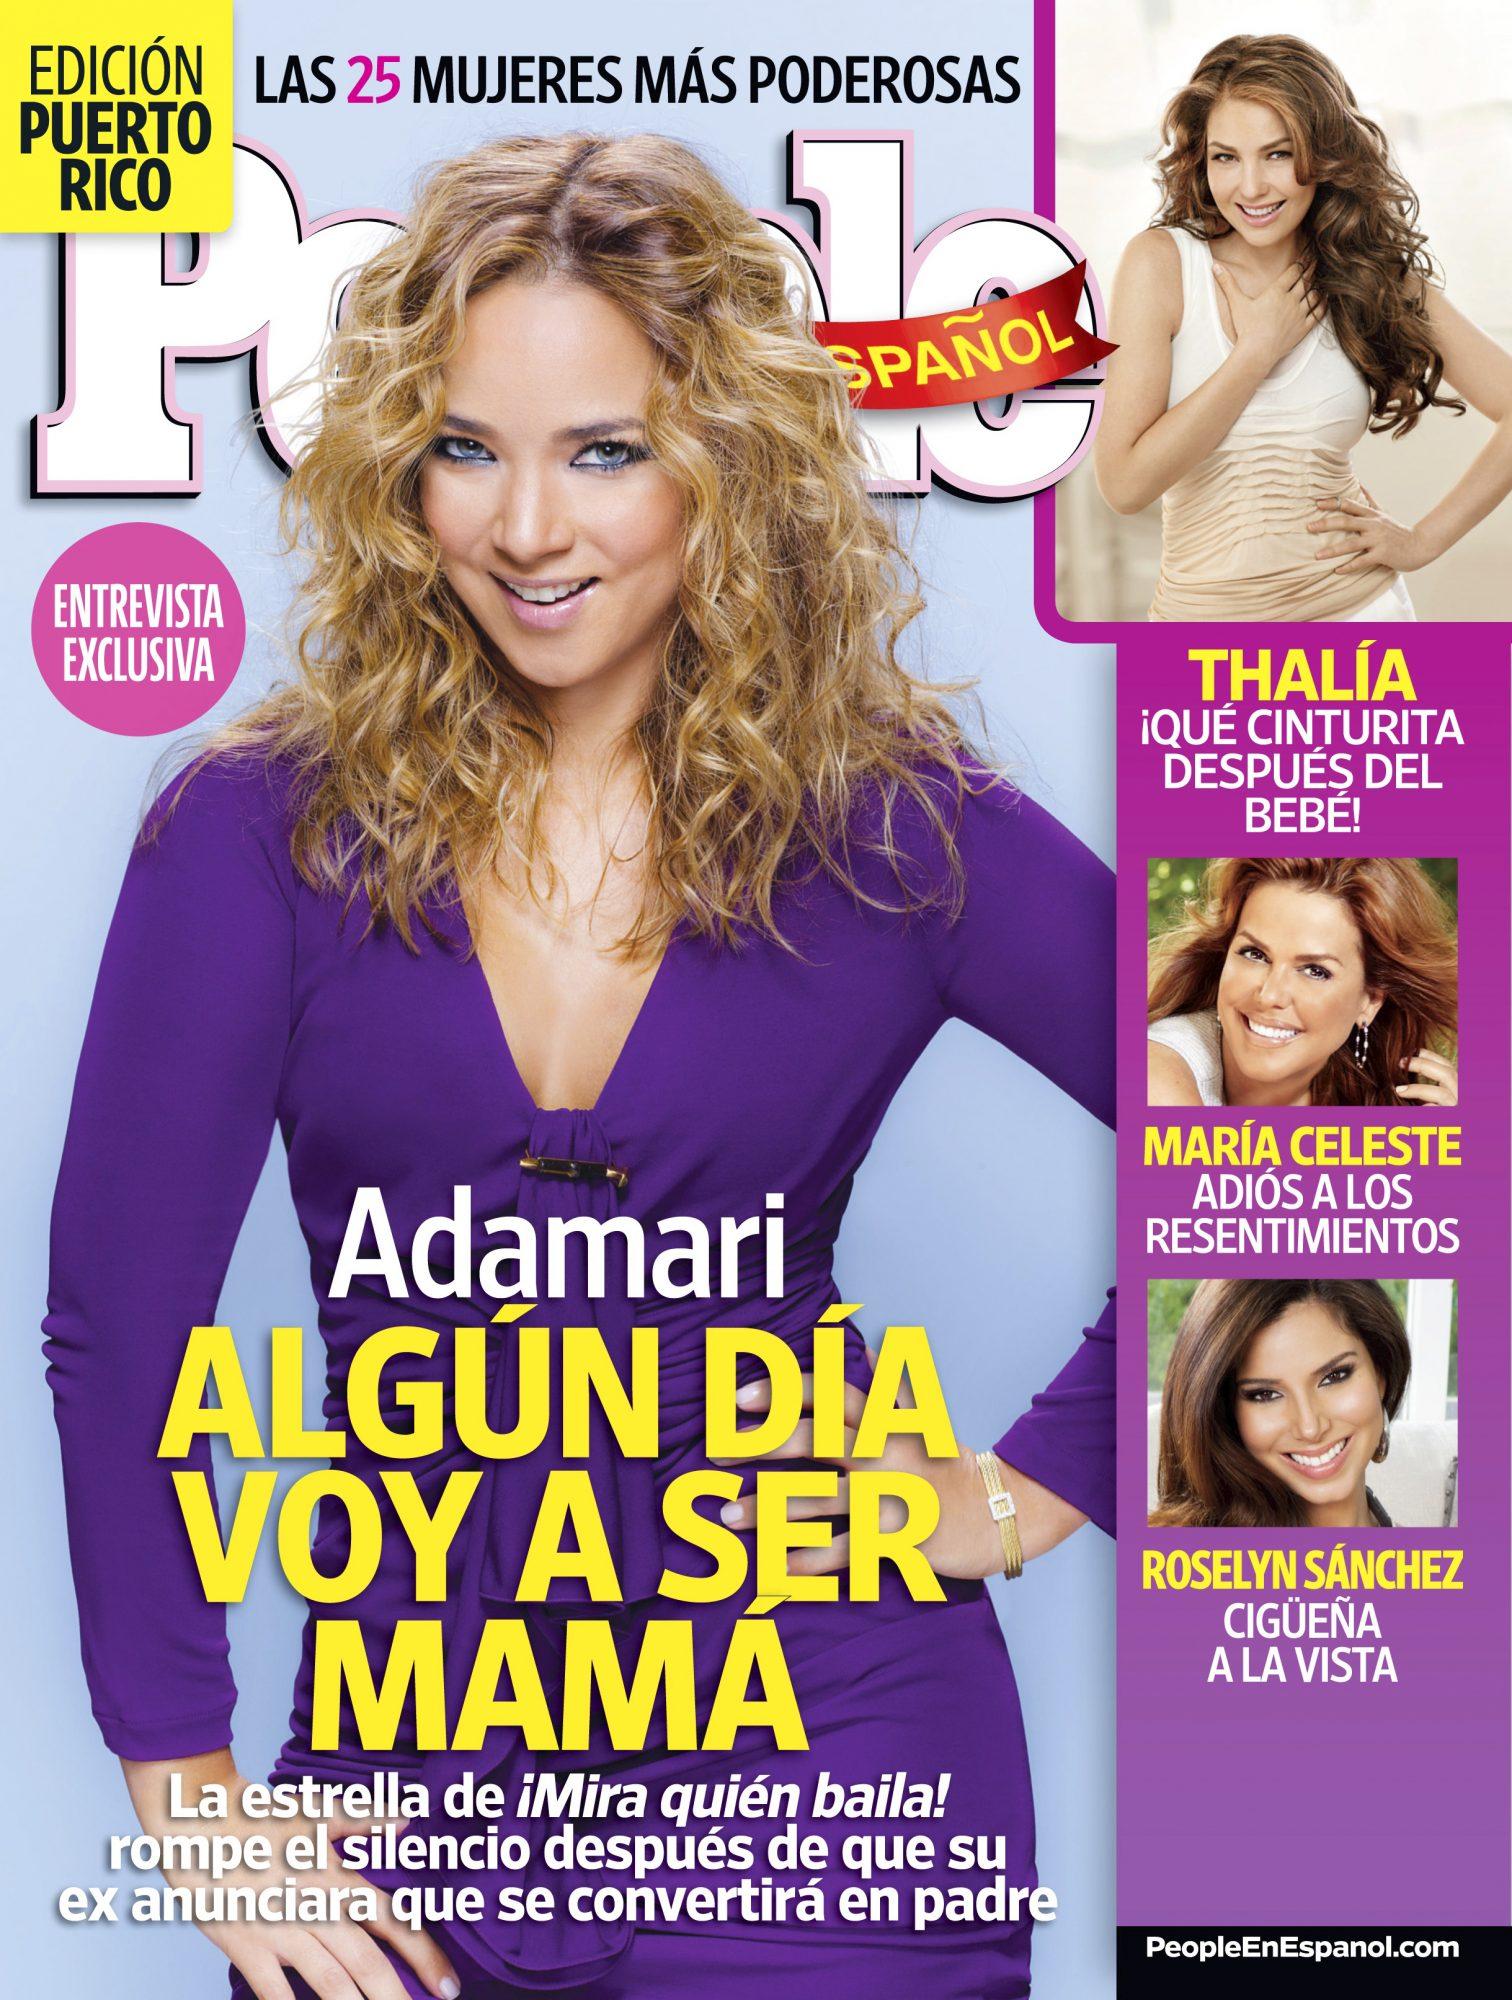 Noviembre 2011 portada - Las 25 Mujeres Mas Poderosas Cover Noviembre 2011 Adamari Lopez Cover